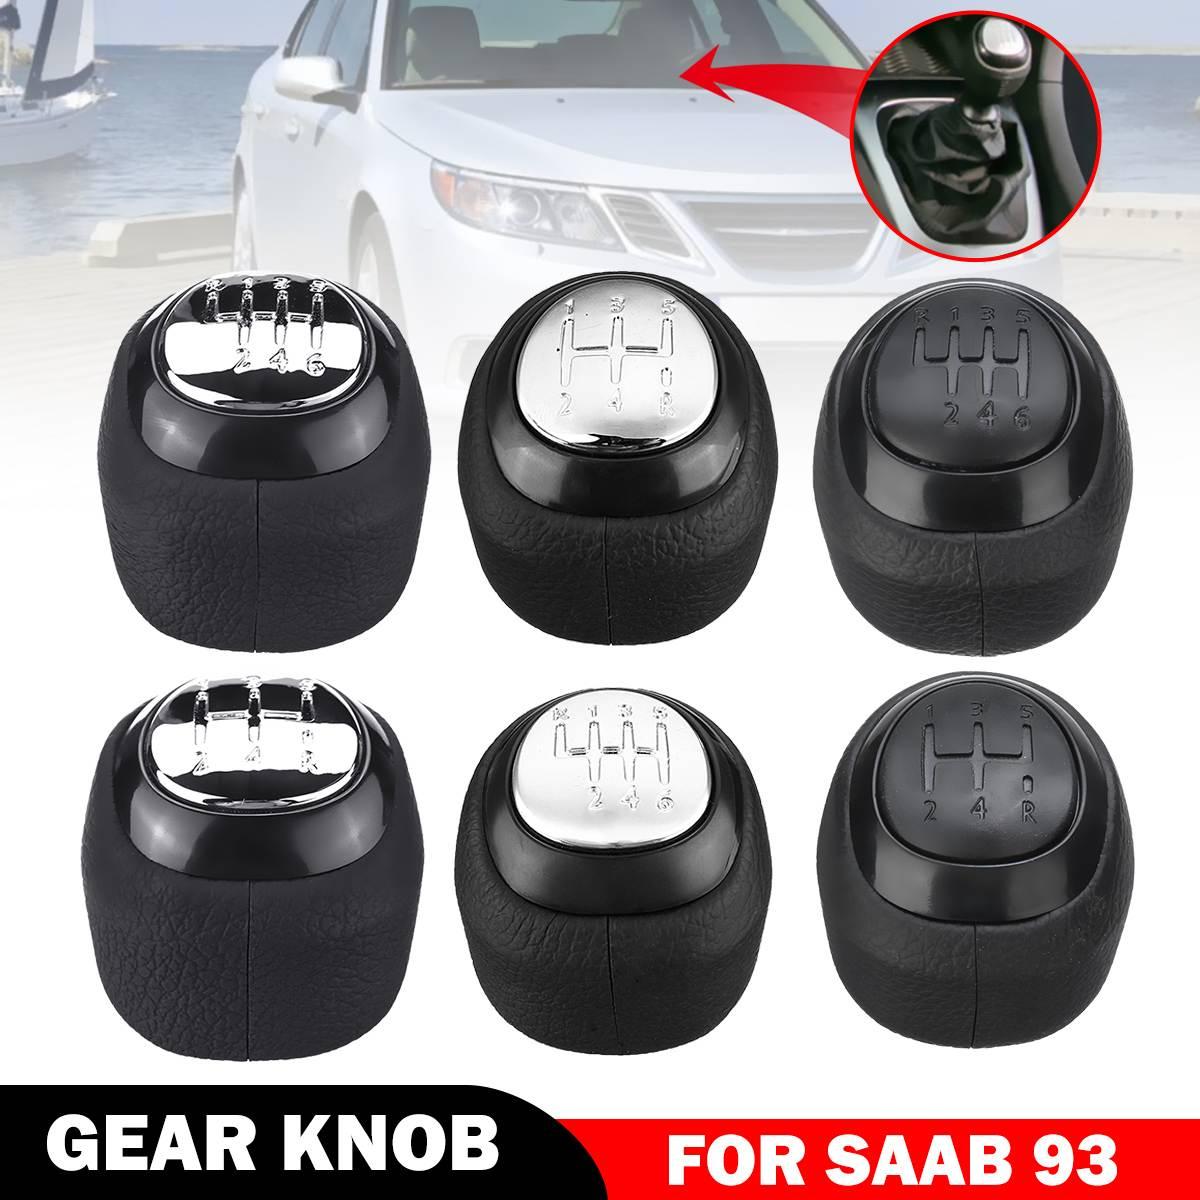 6 Speed PU Leather Gear Shift Knob For SAAB 9-3 93 2003-2012 #55566206